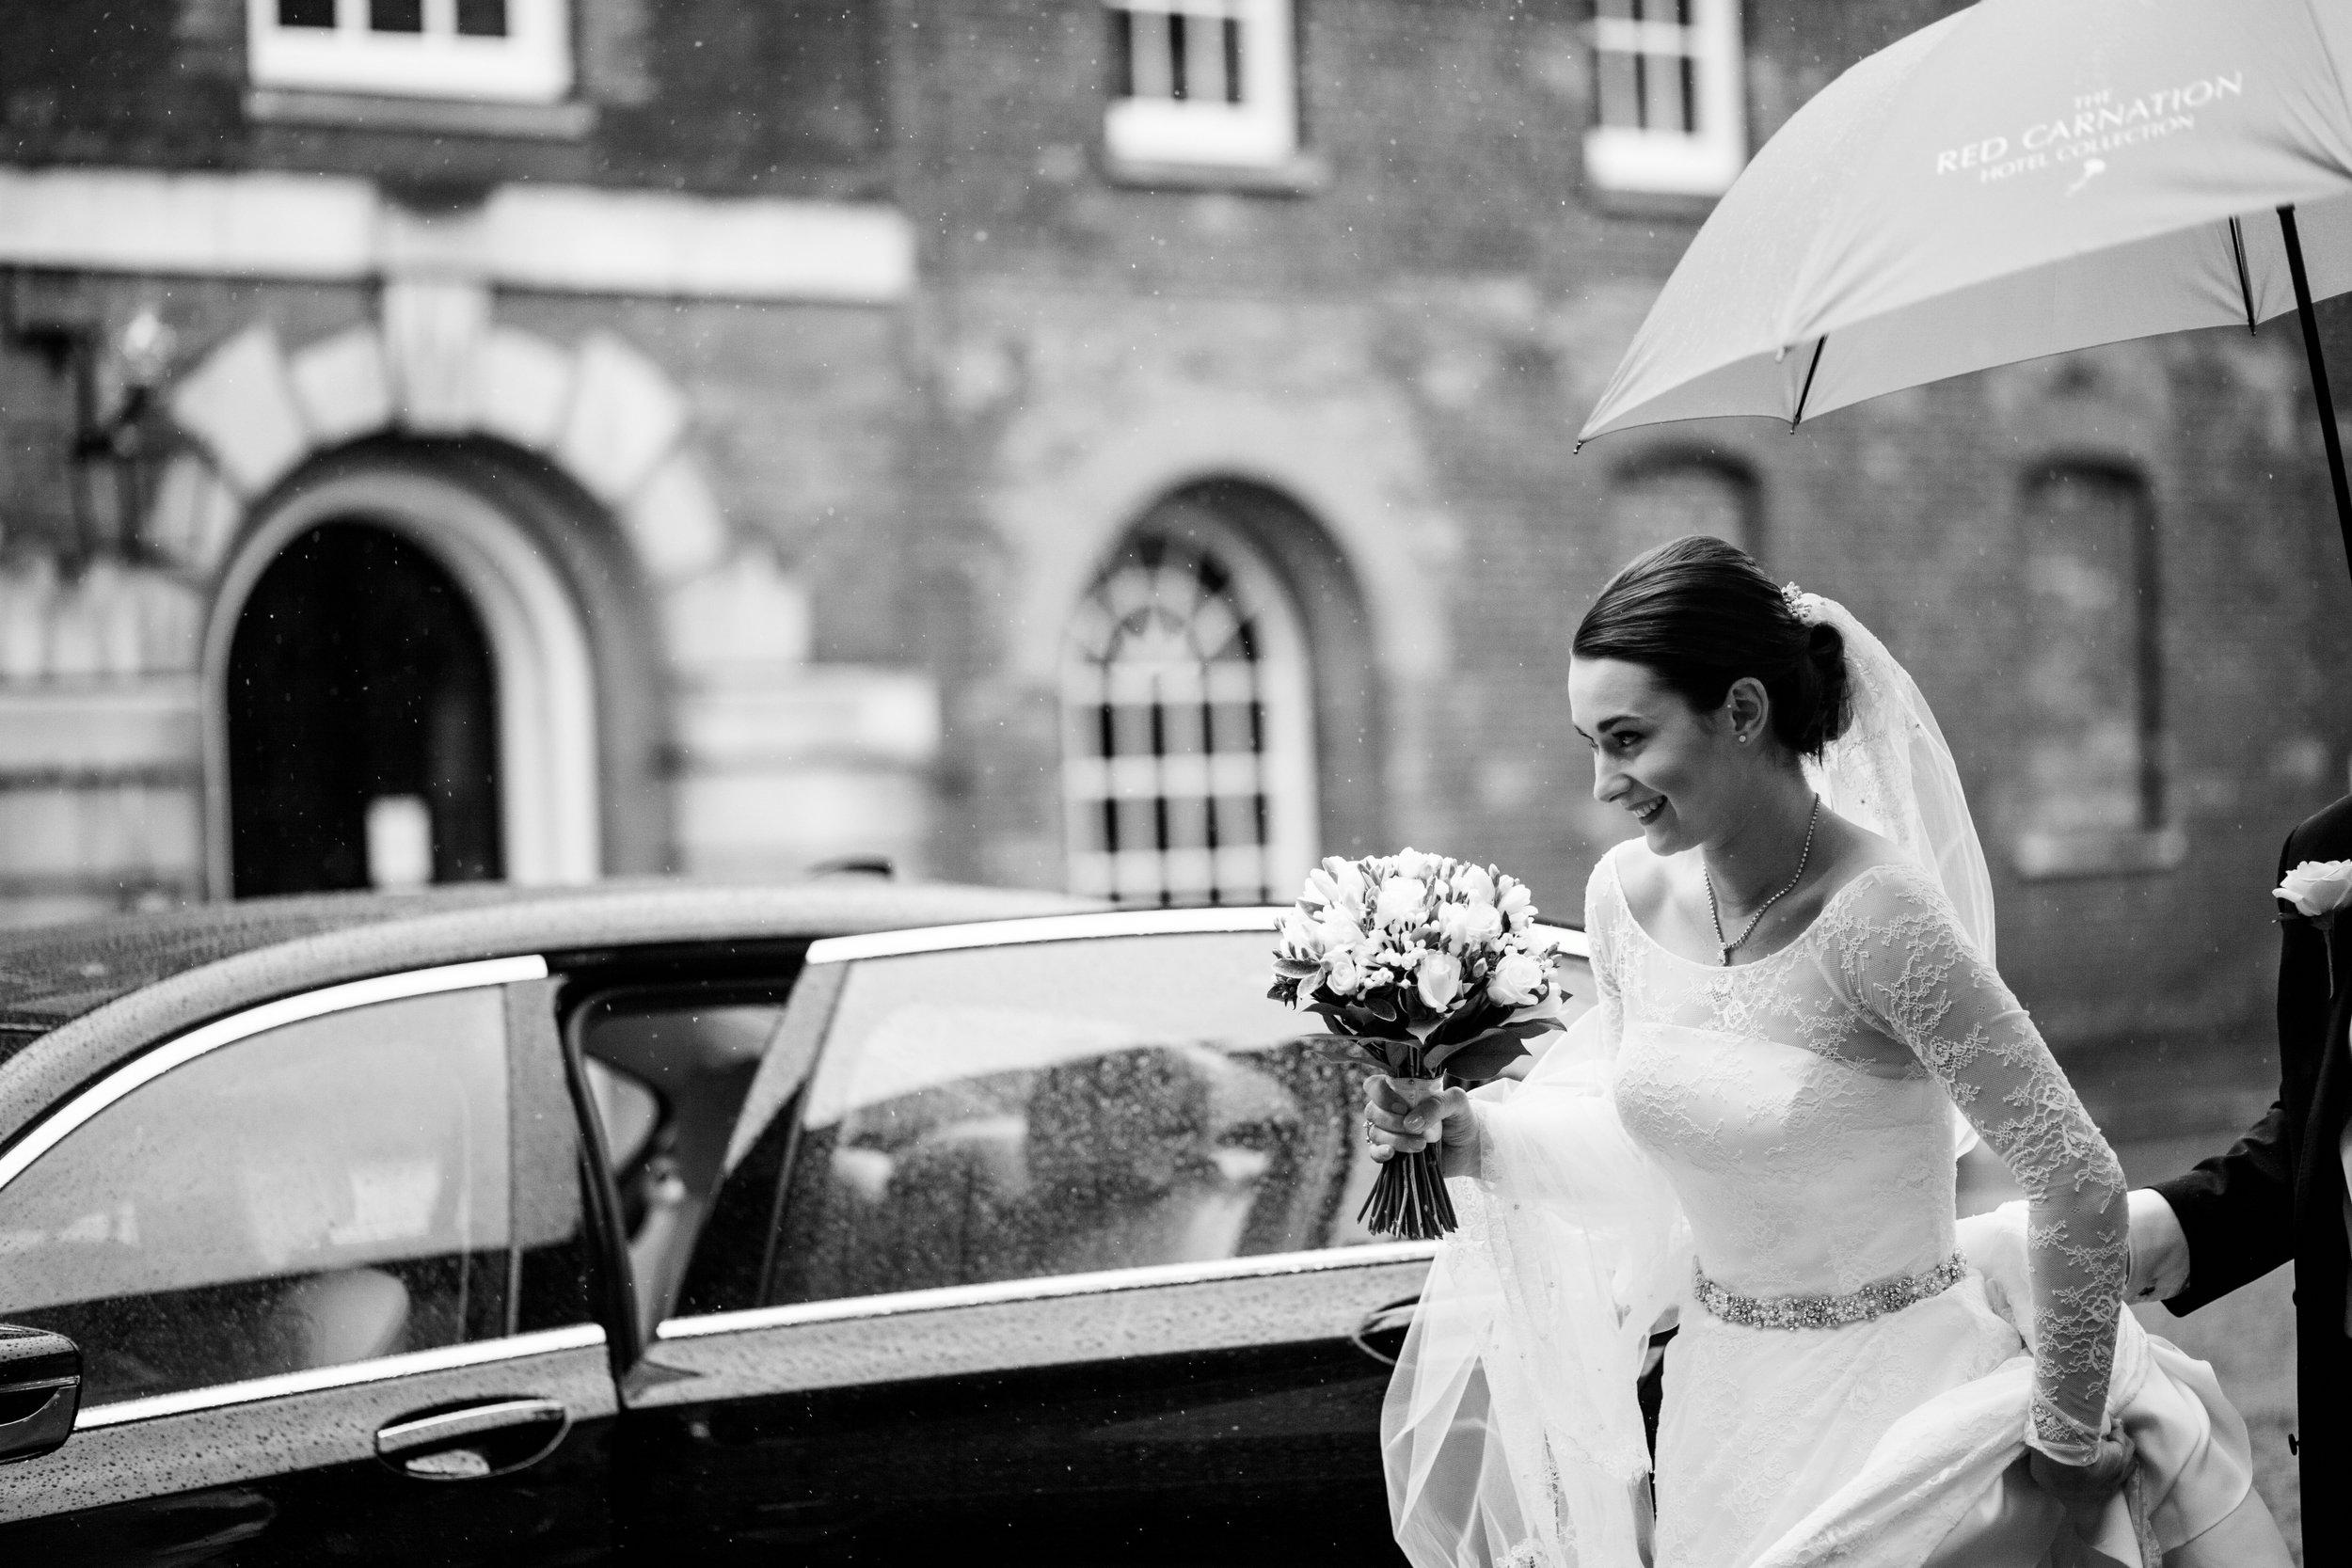 St James's Palace Wedding